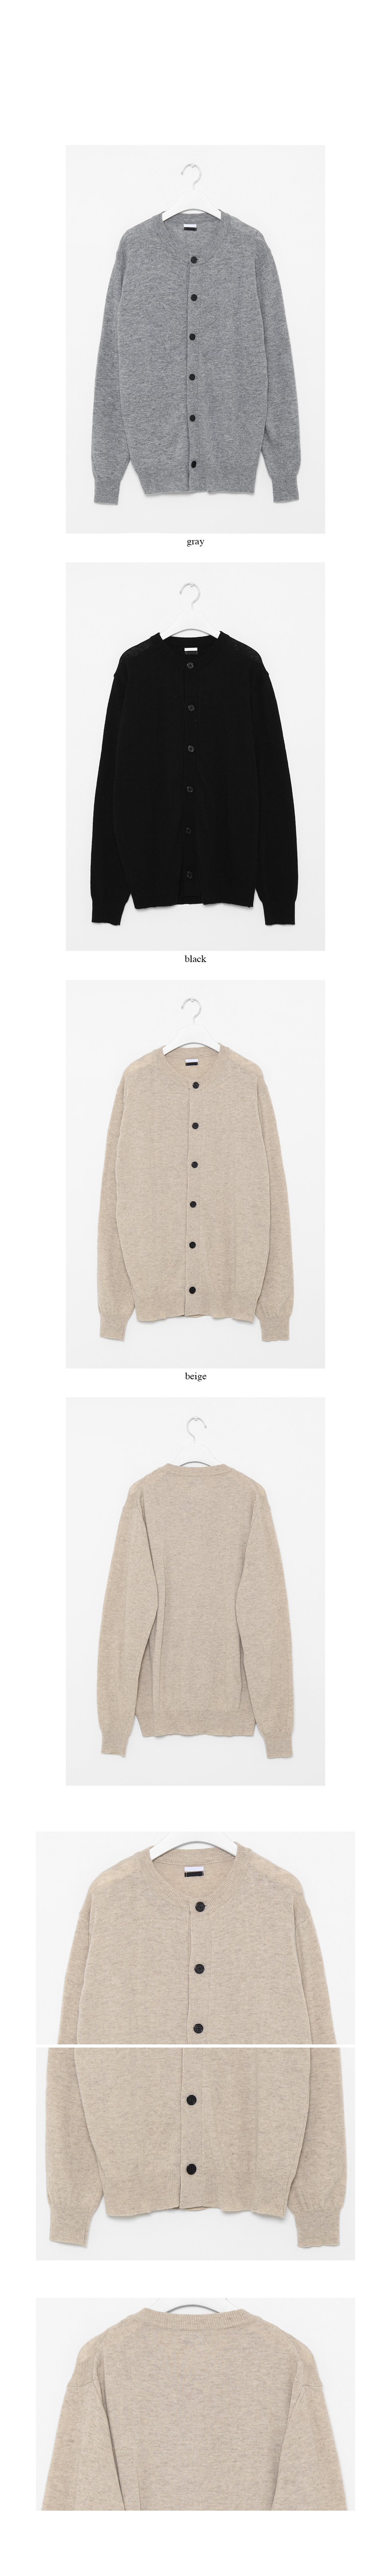 round cashmere cardigan